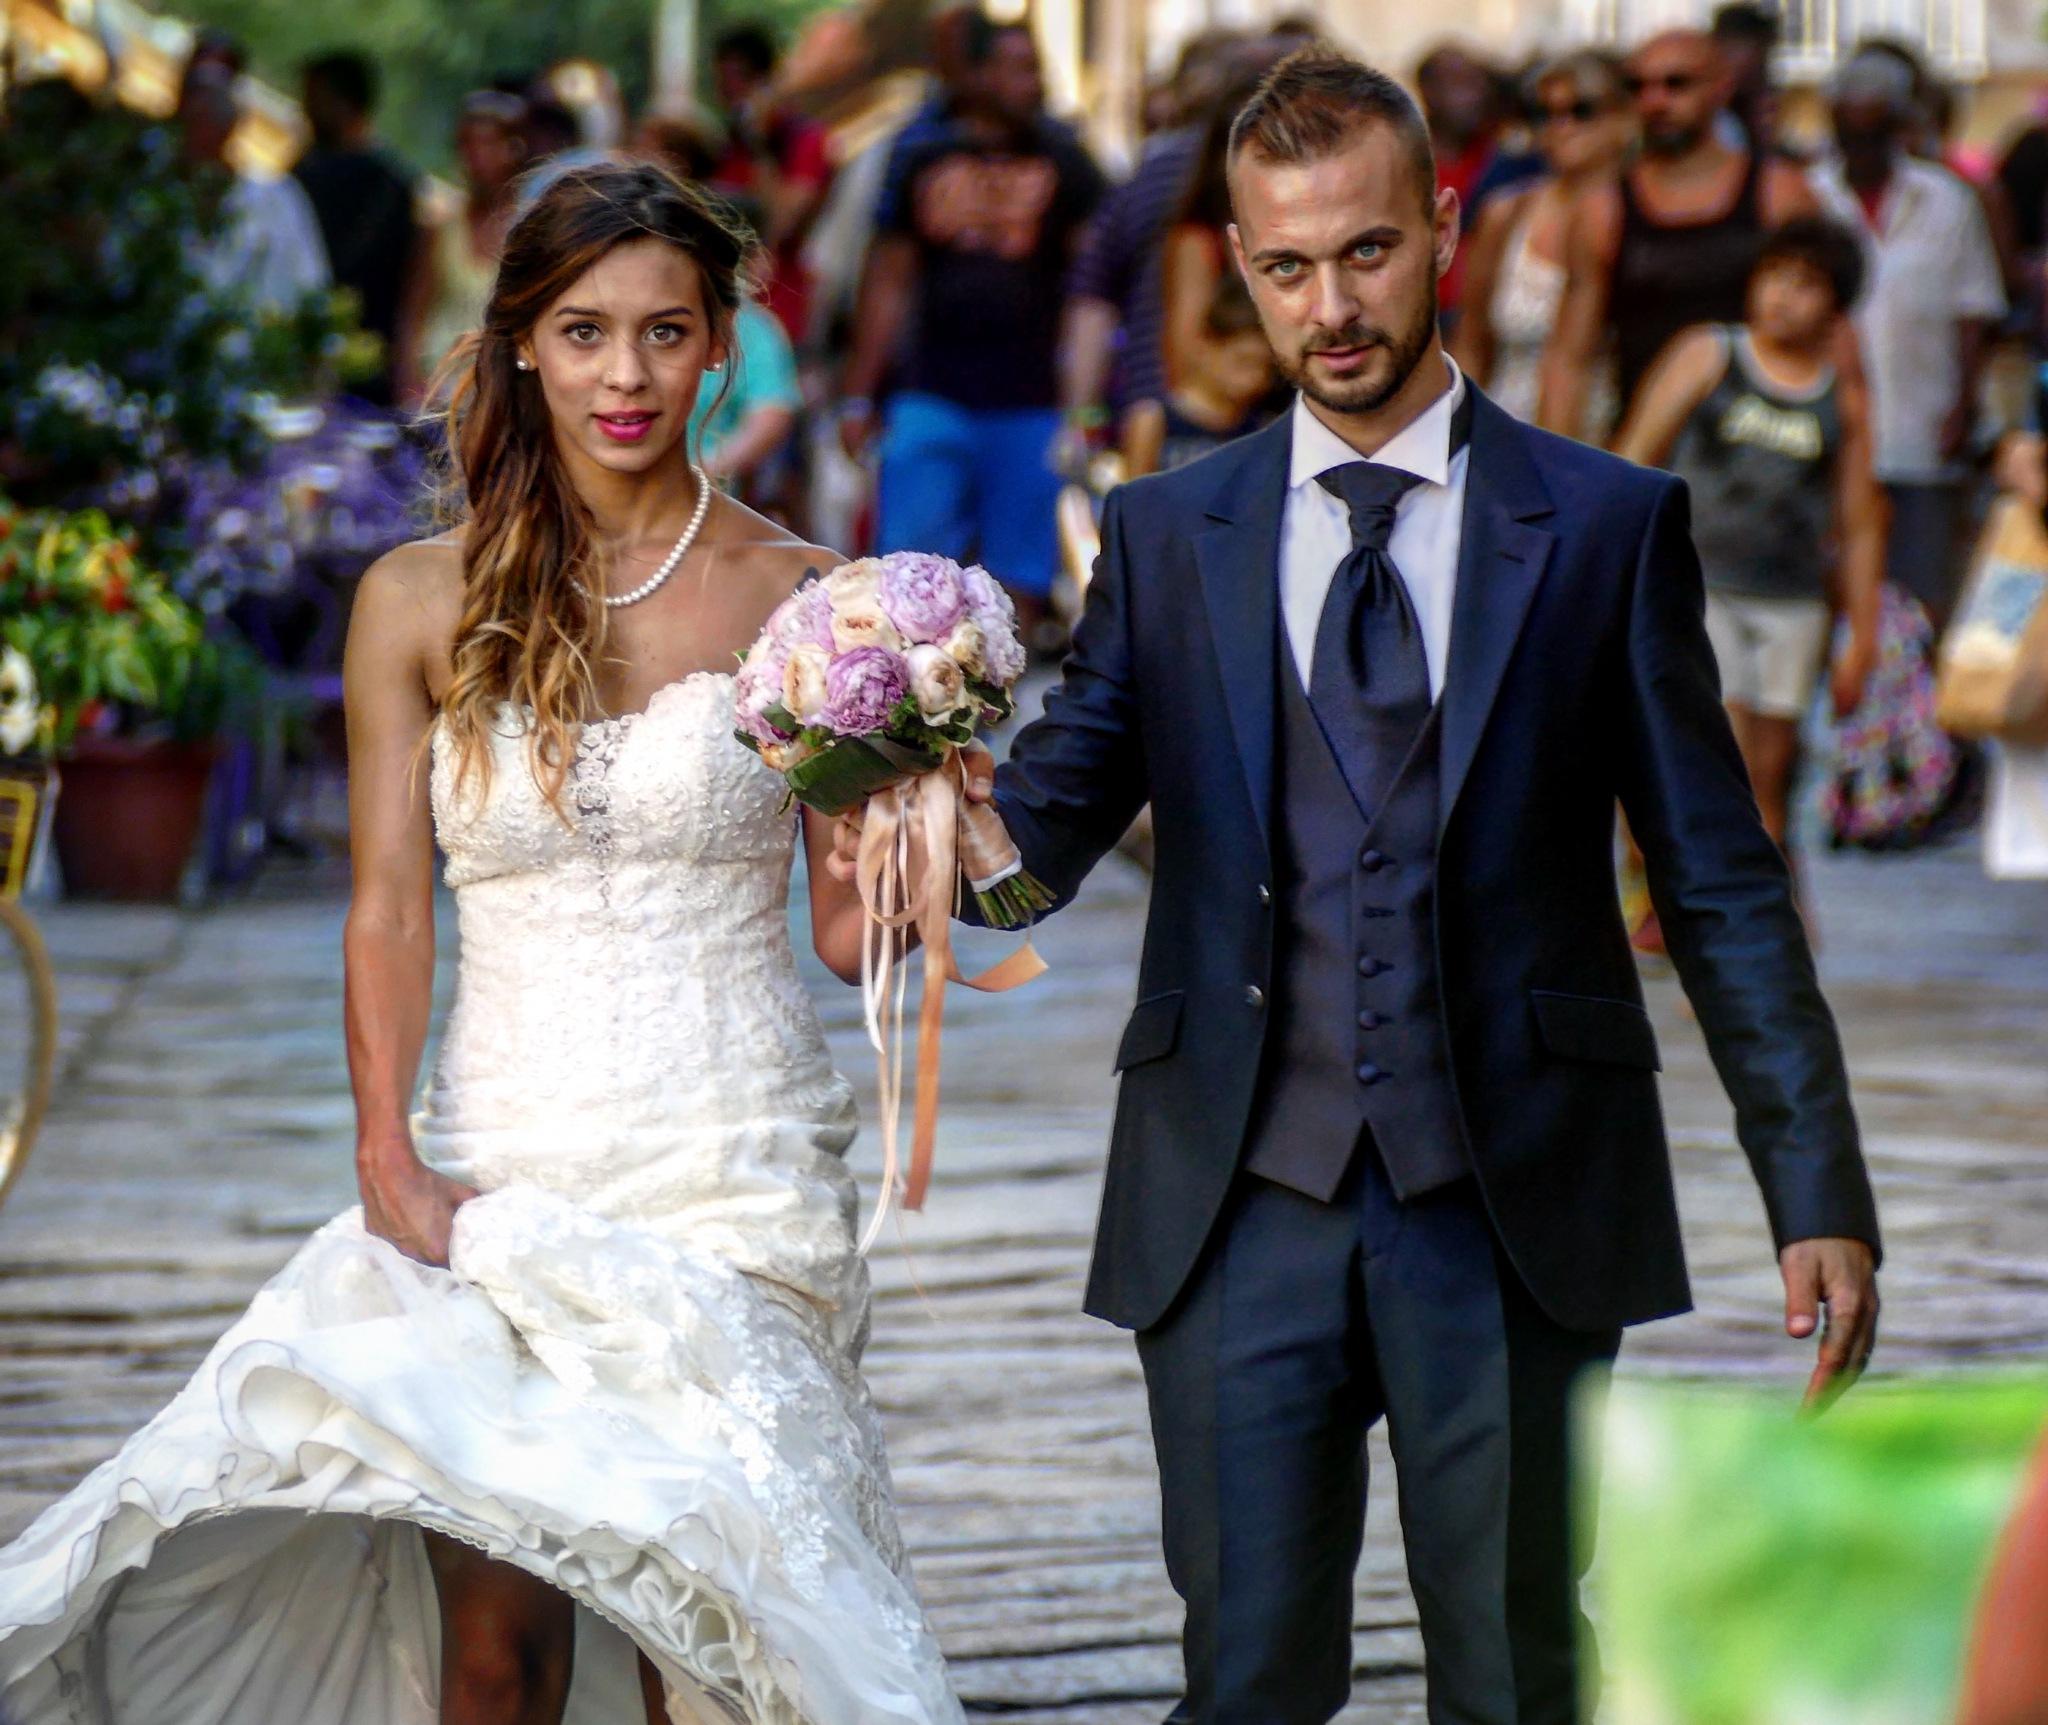 Italian wedding by PelleBlohm